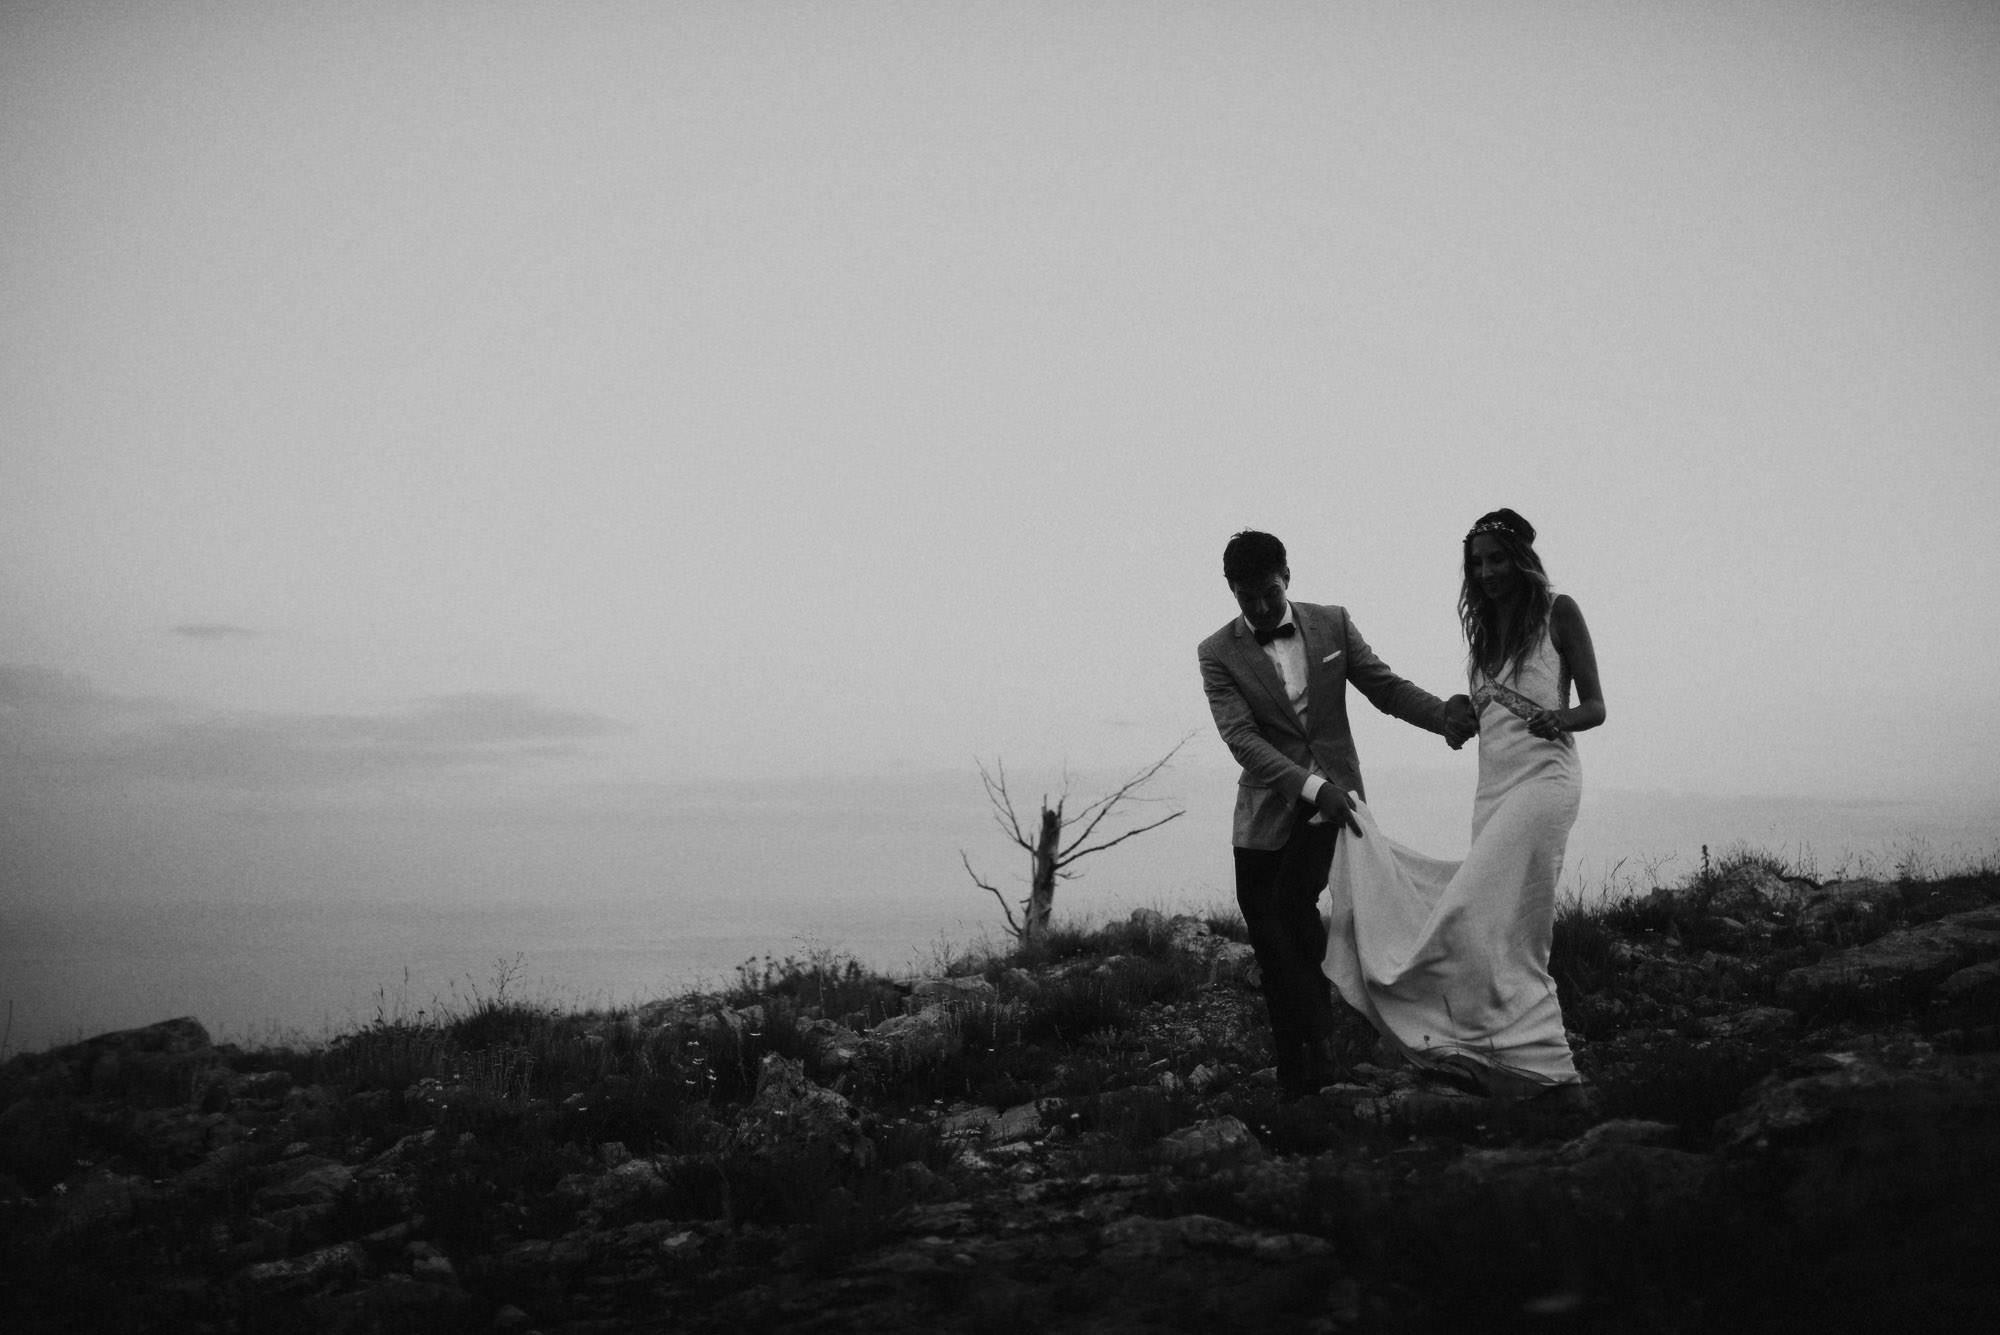 dubrovnik_croatia_wedding_photographer-jere_satamo-destination_weddings-122-web.jpg